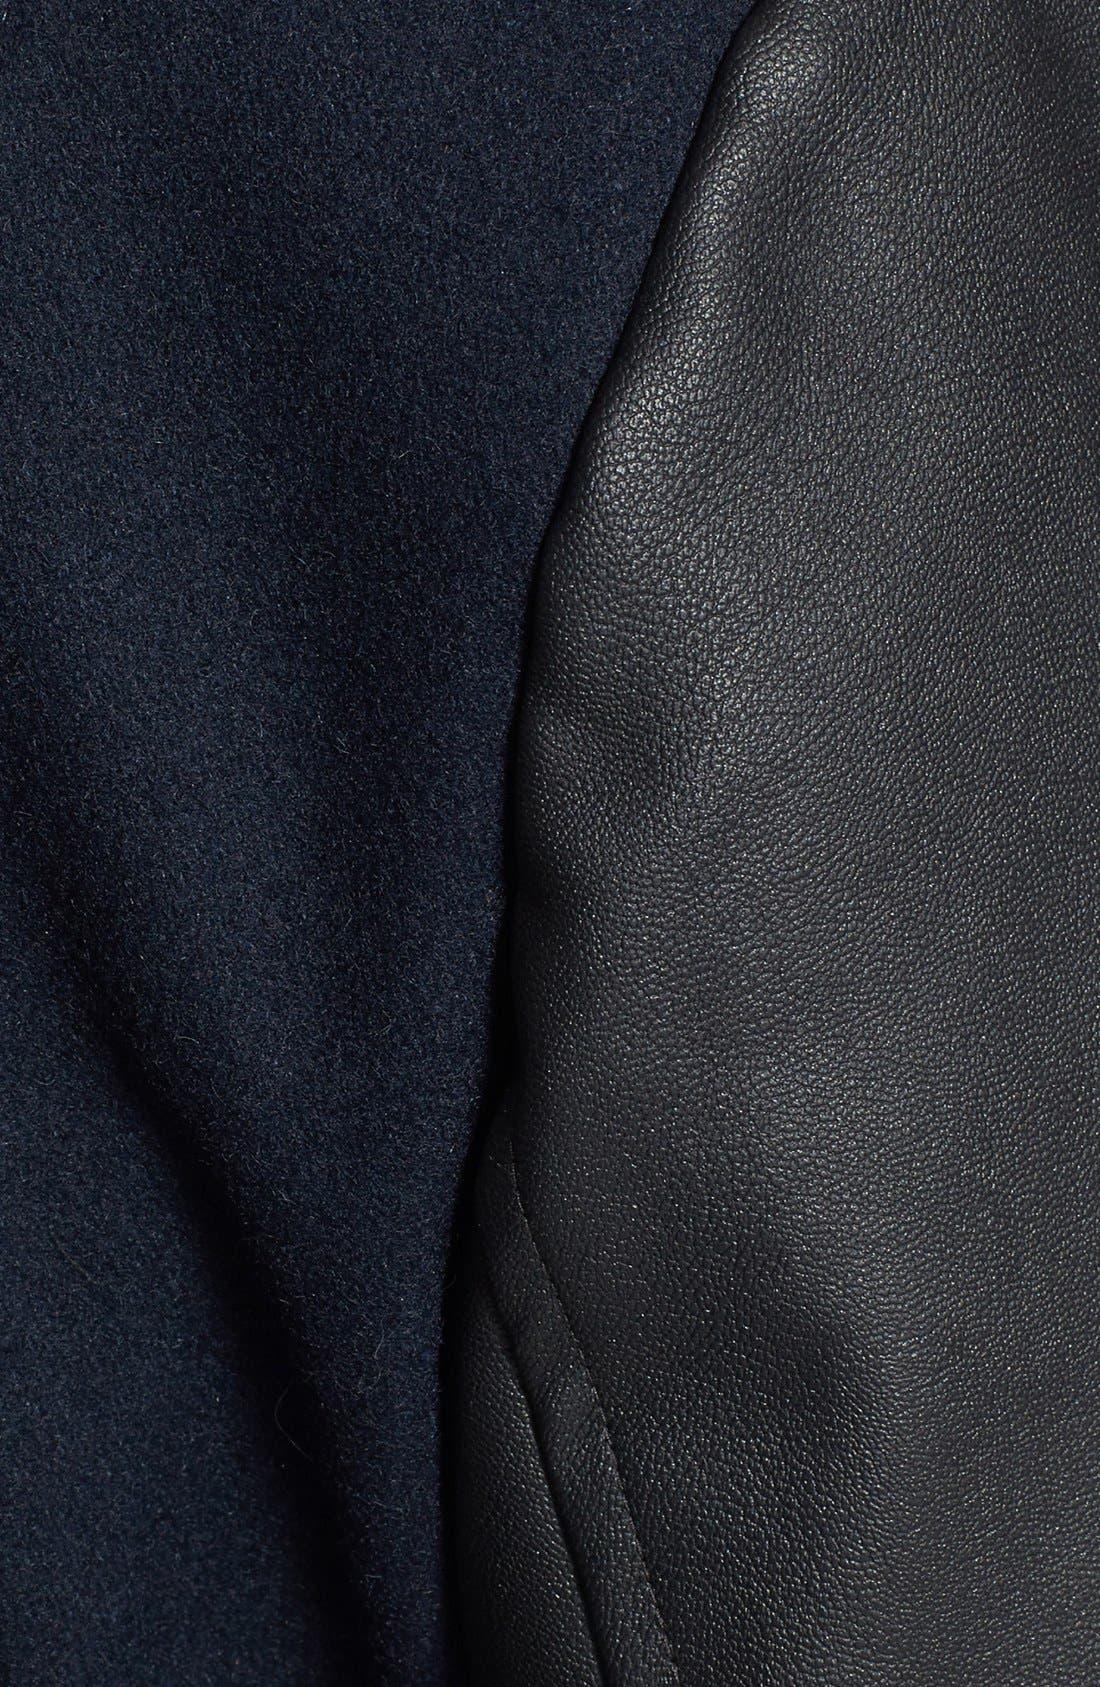 Wool Blend & Faux Leather Coat,                             Alternate thumbnail 2, color,                             410